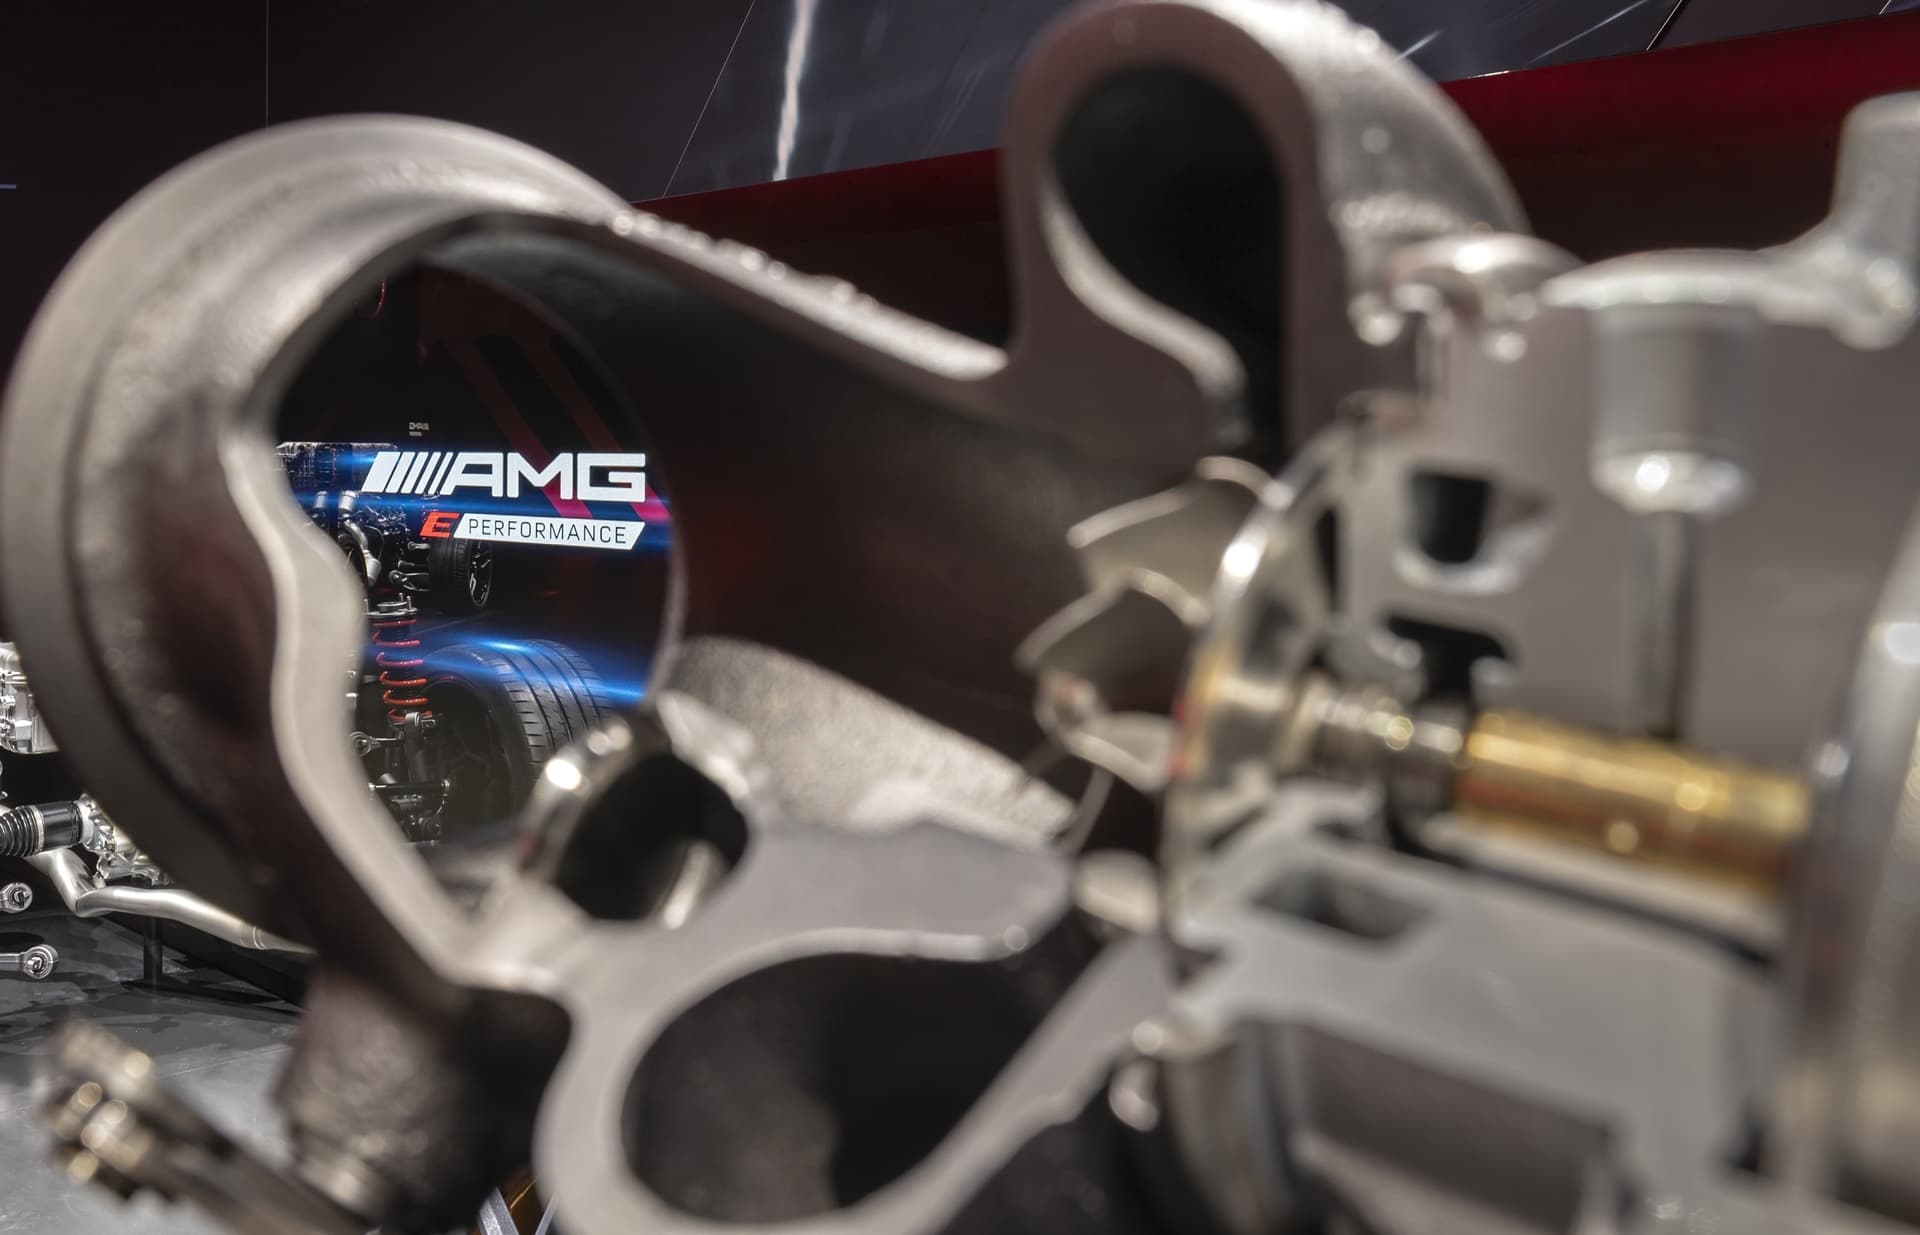 Mercedes Amg Motor Turbo Electrico 2021 0321 003